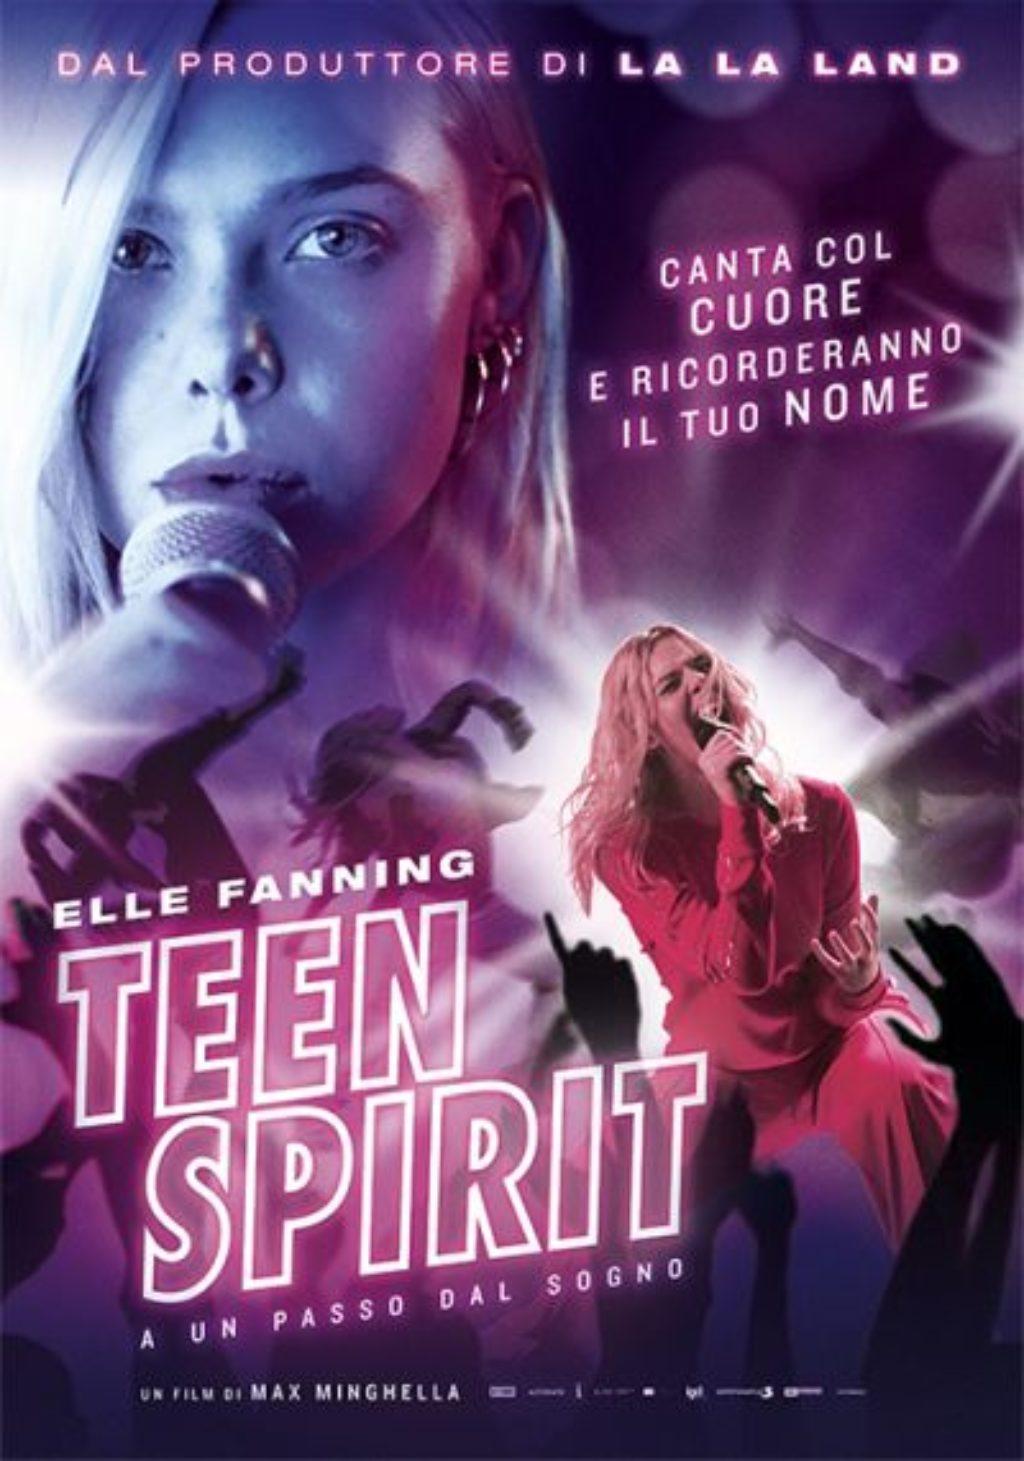 TEEN SPIRIT - A UN PASSO DAL SOGNO